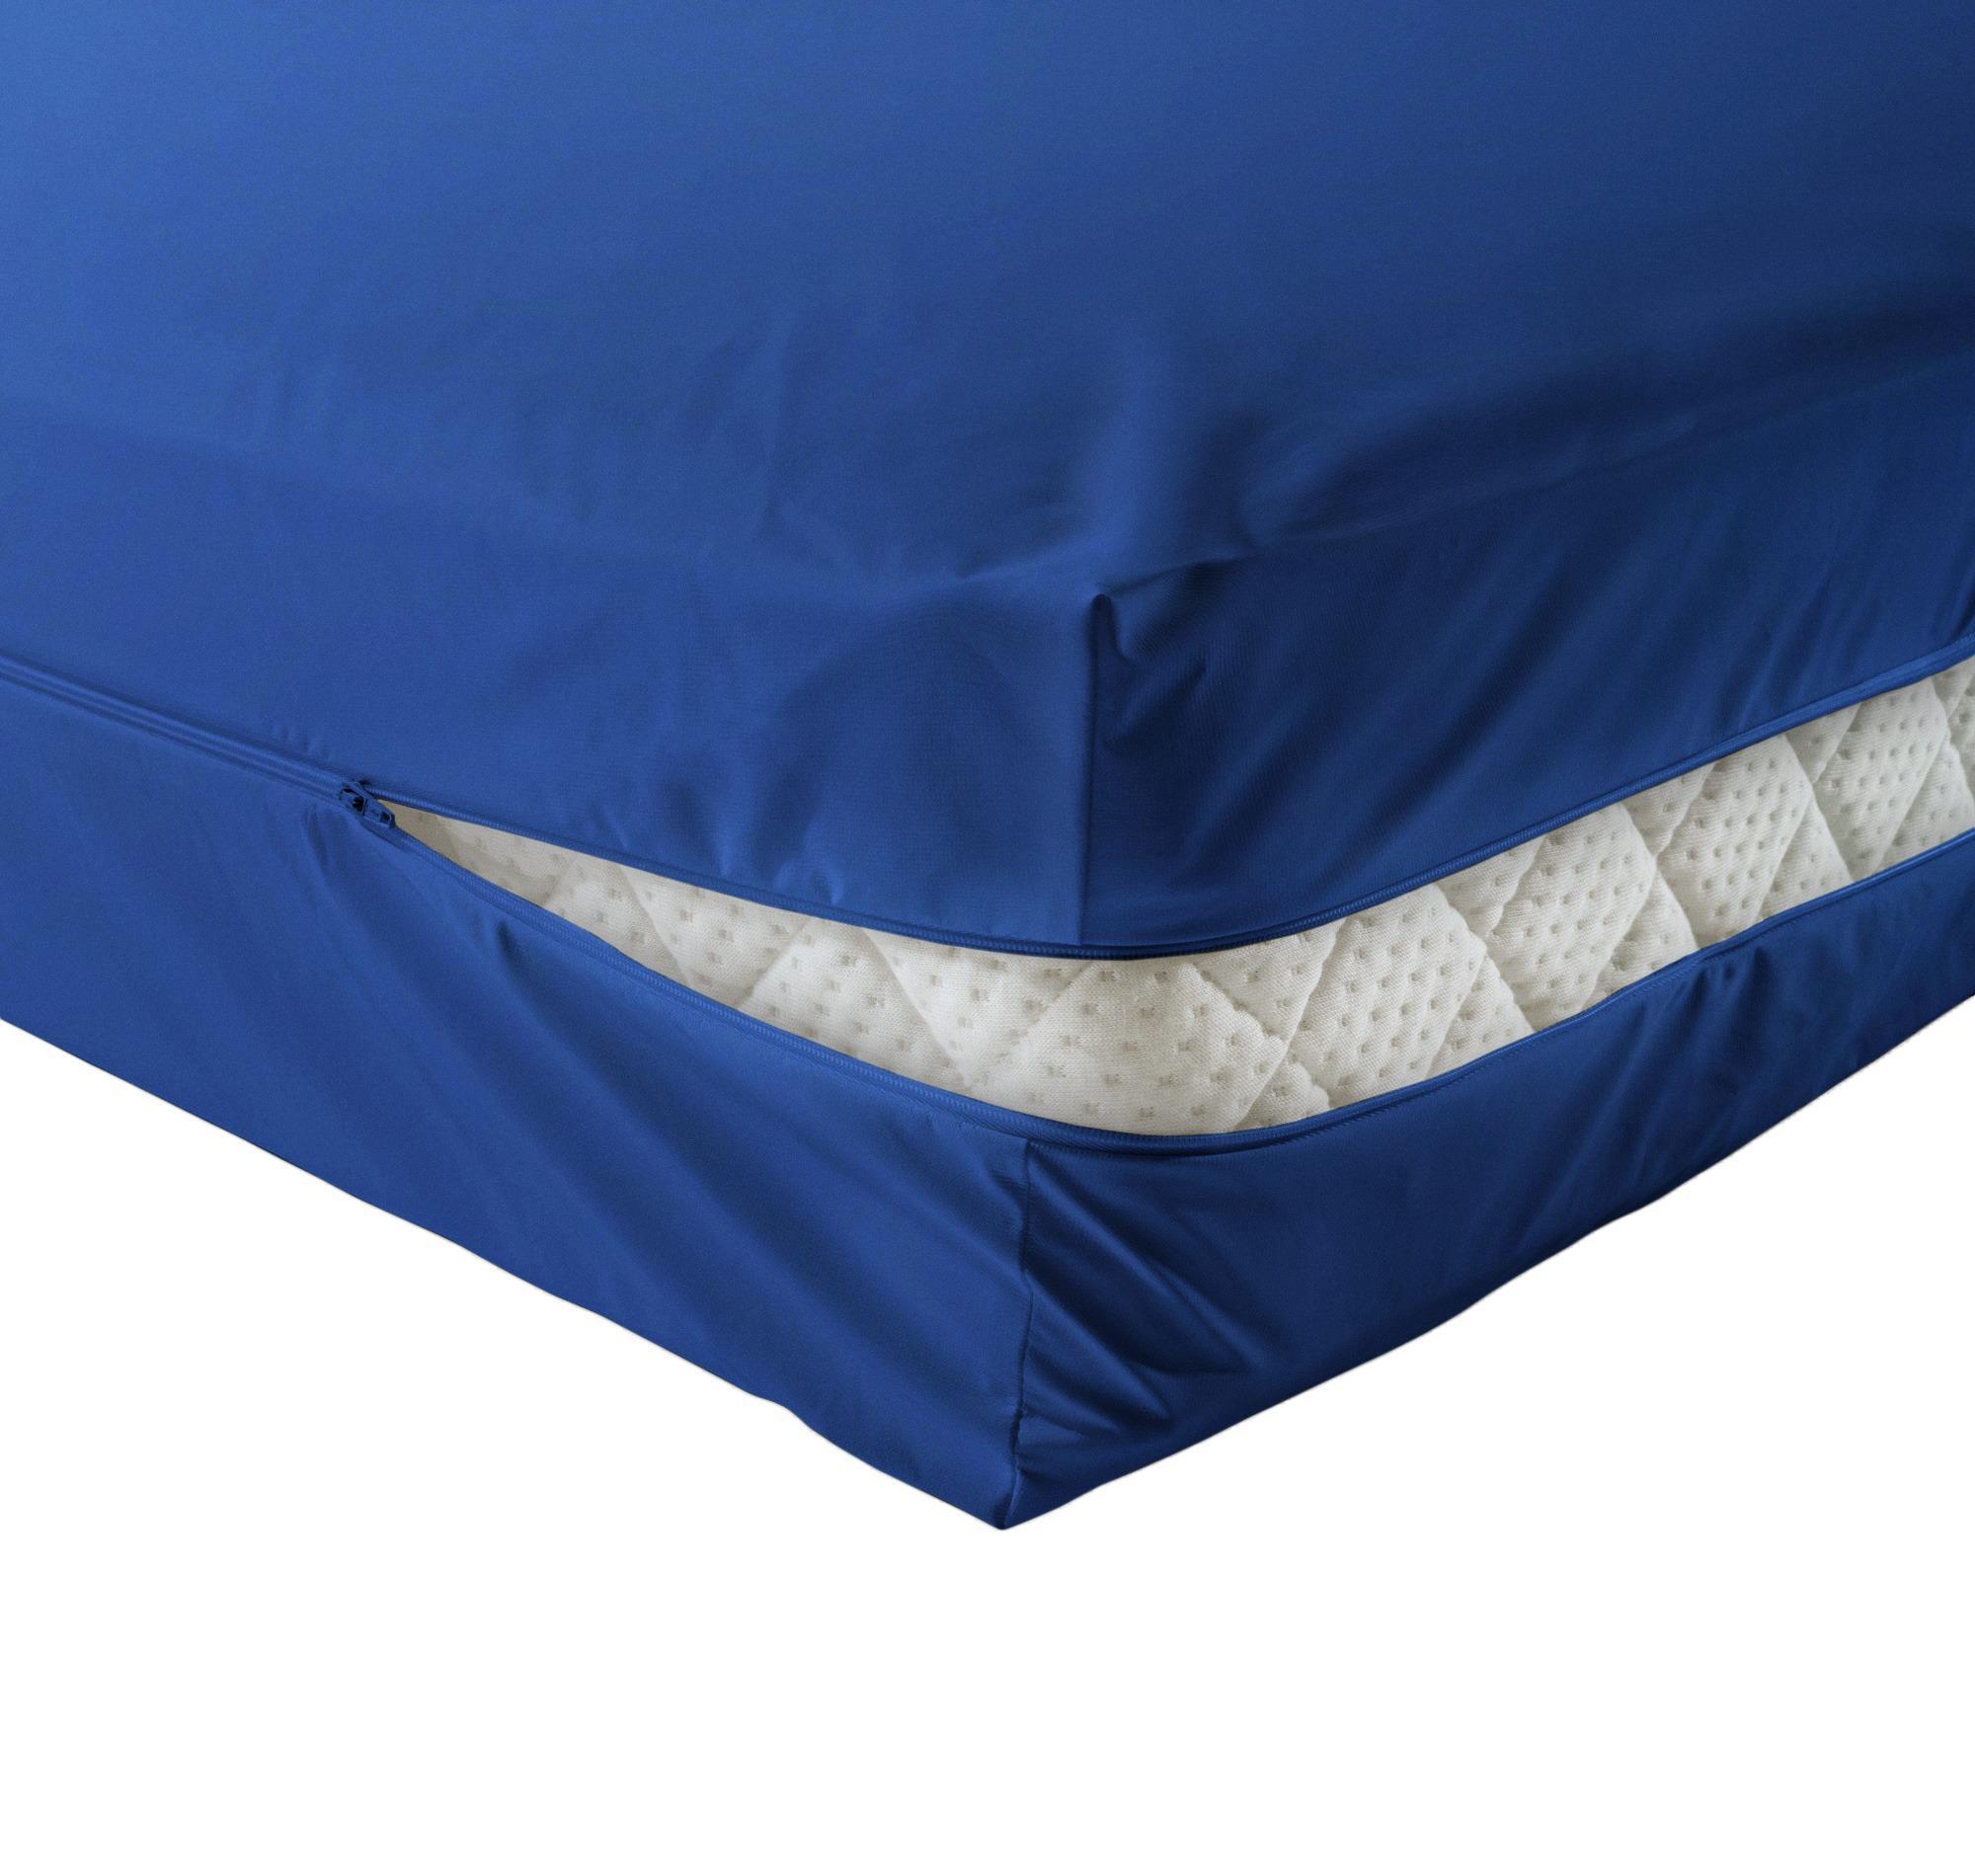 Unversteppter Matratzenbezug blau | Matratzenschutz24.net